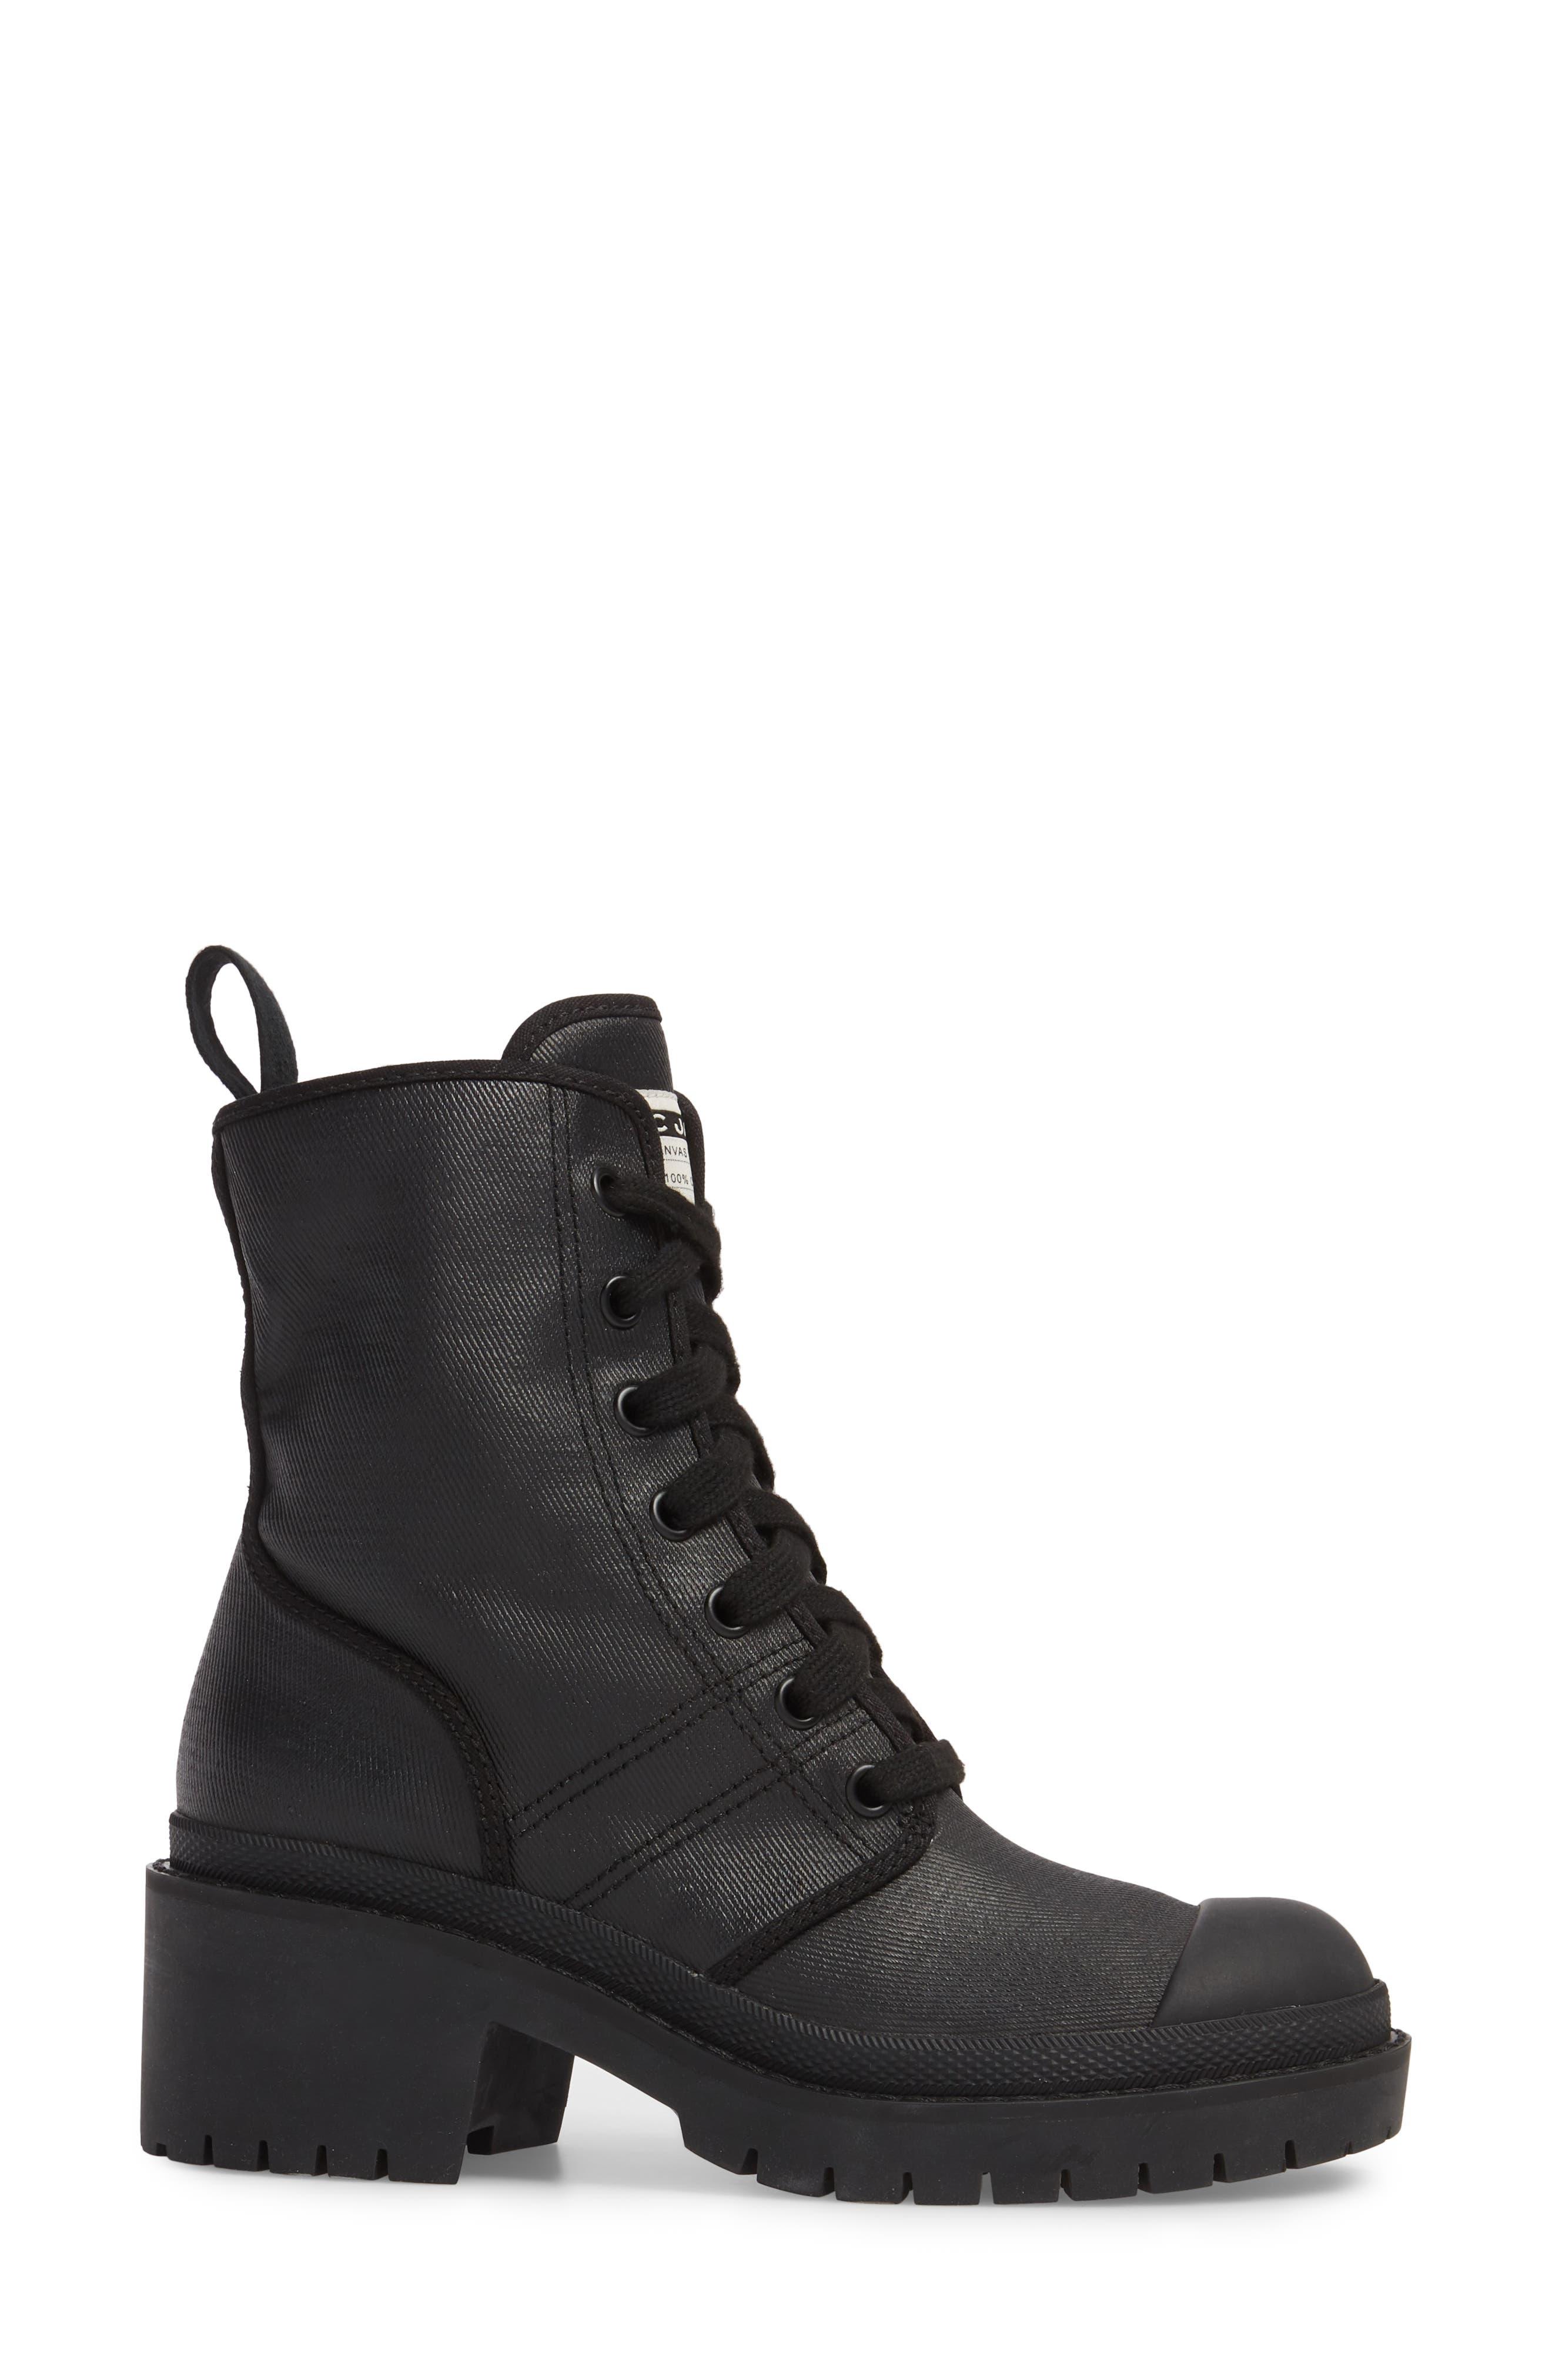 Bristol Lace-Up Boot,                             Alternate thumbnail 3, color,                             001